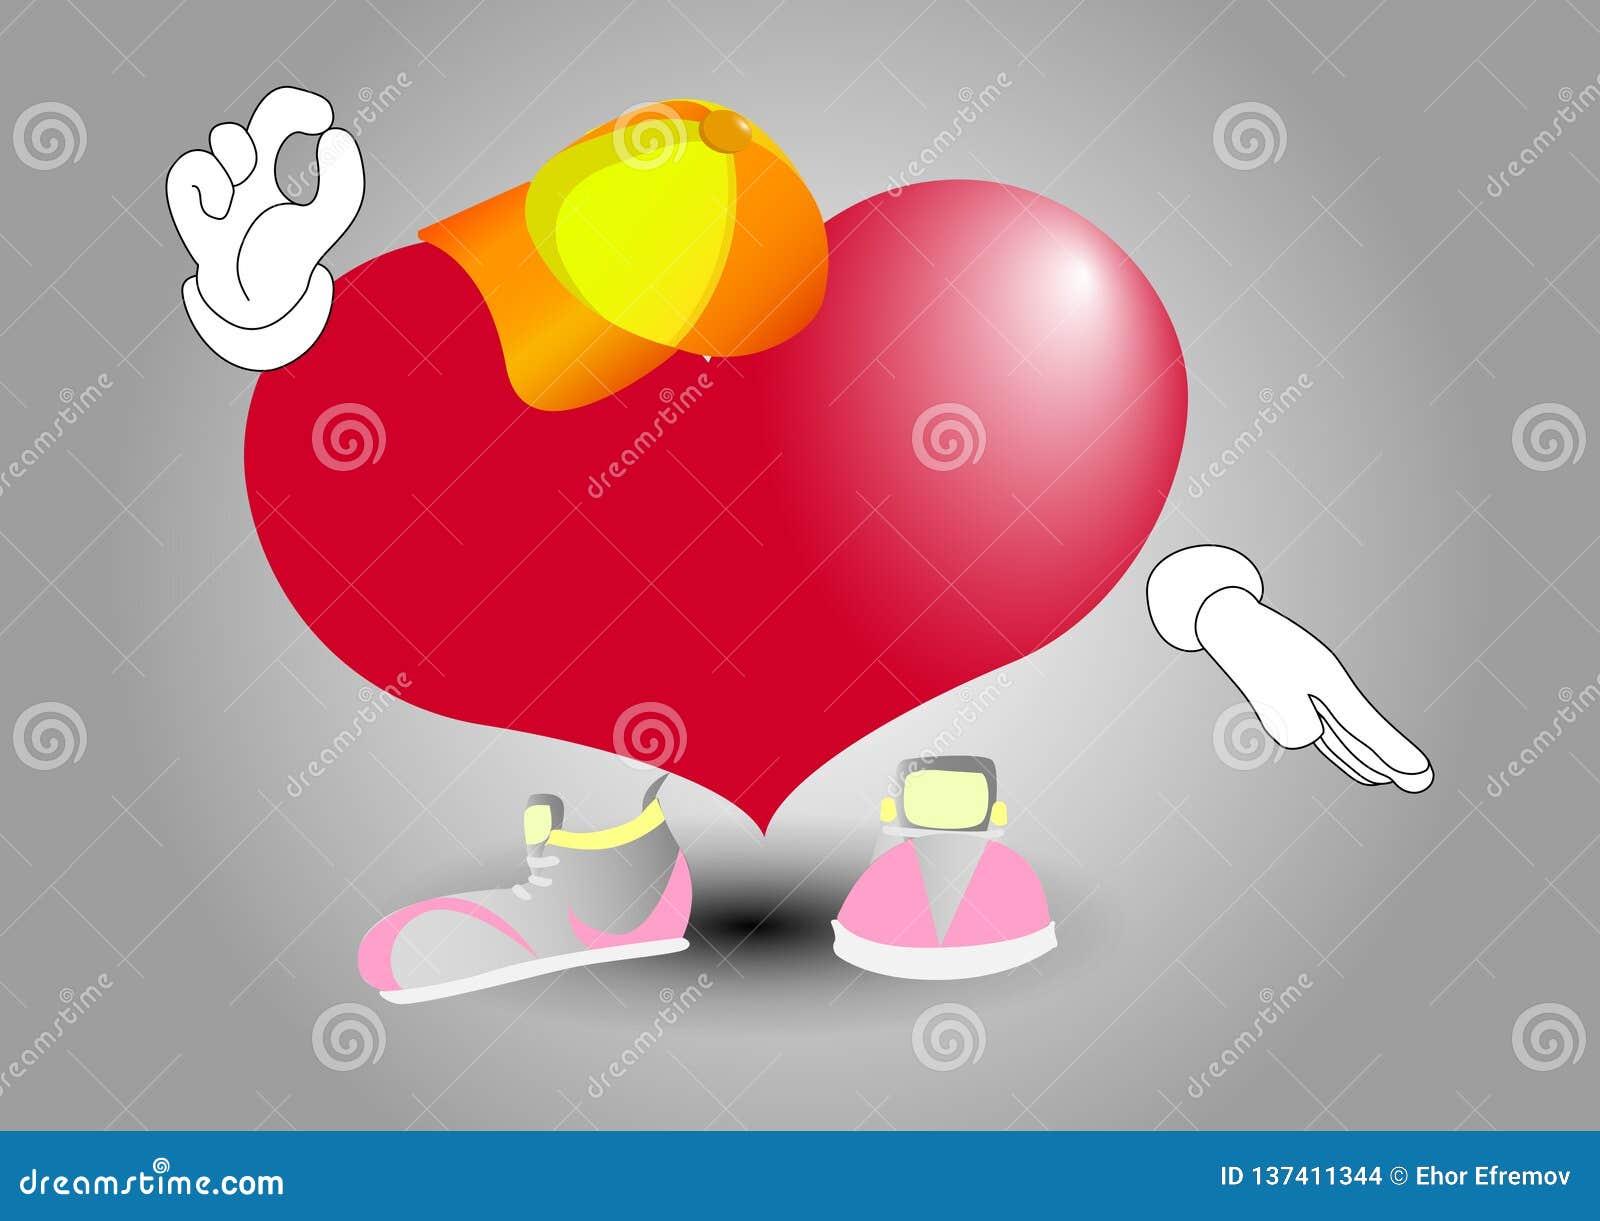 Cardiac okay.When the heart is all right.